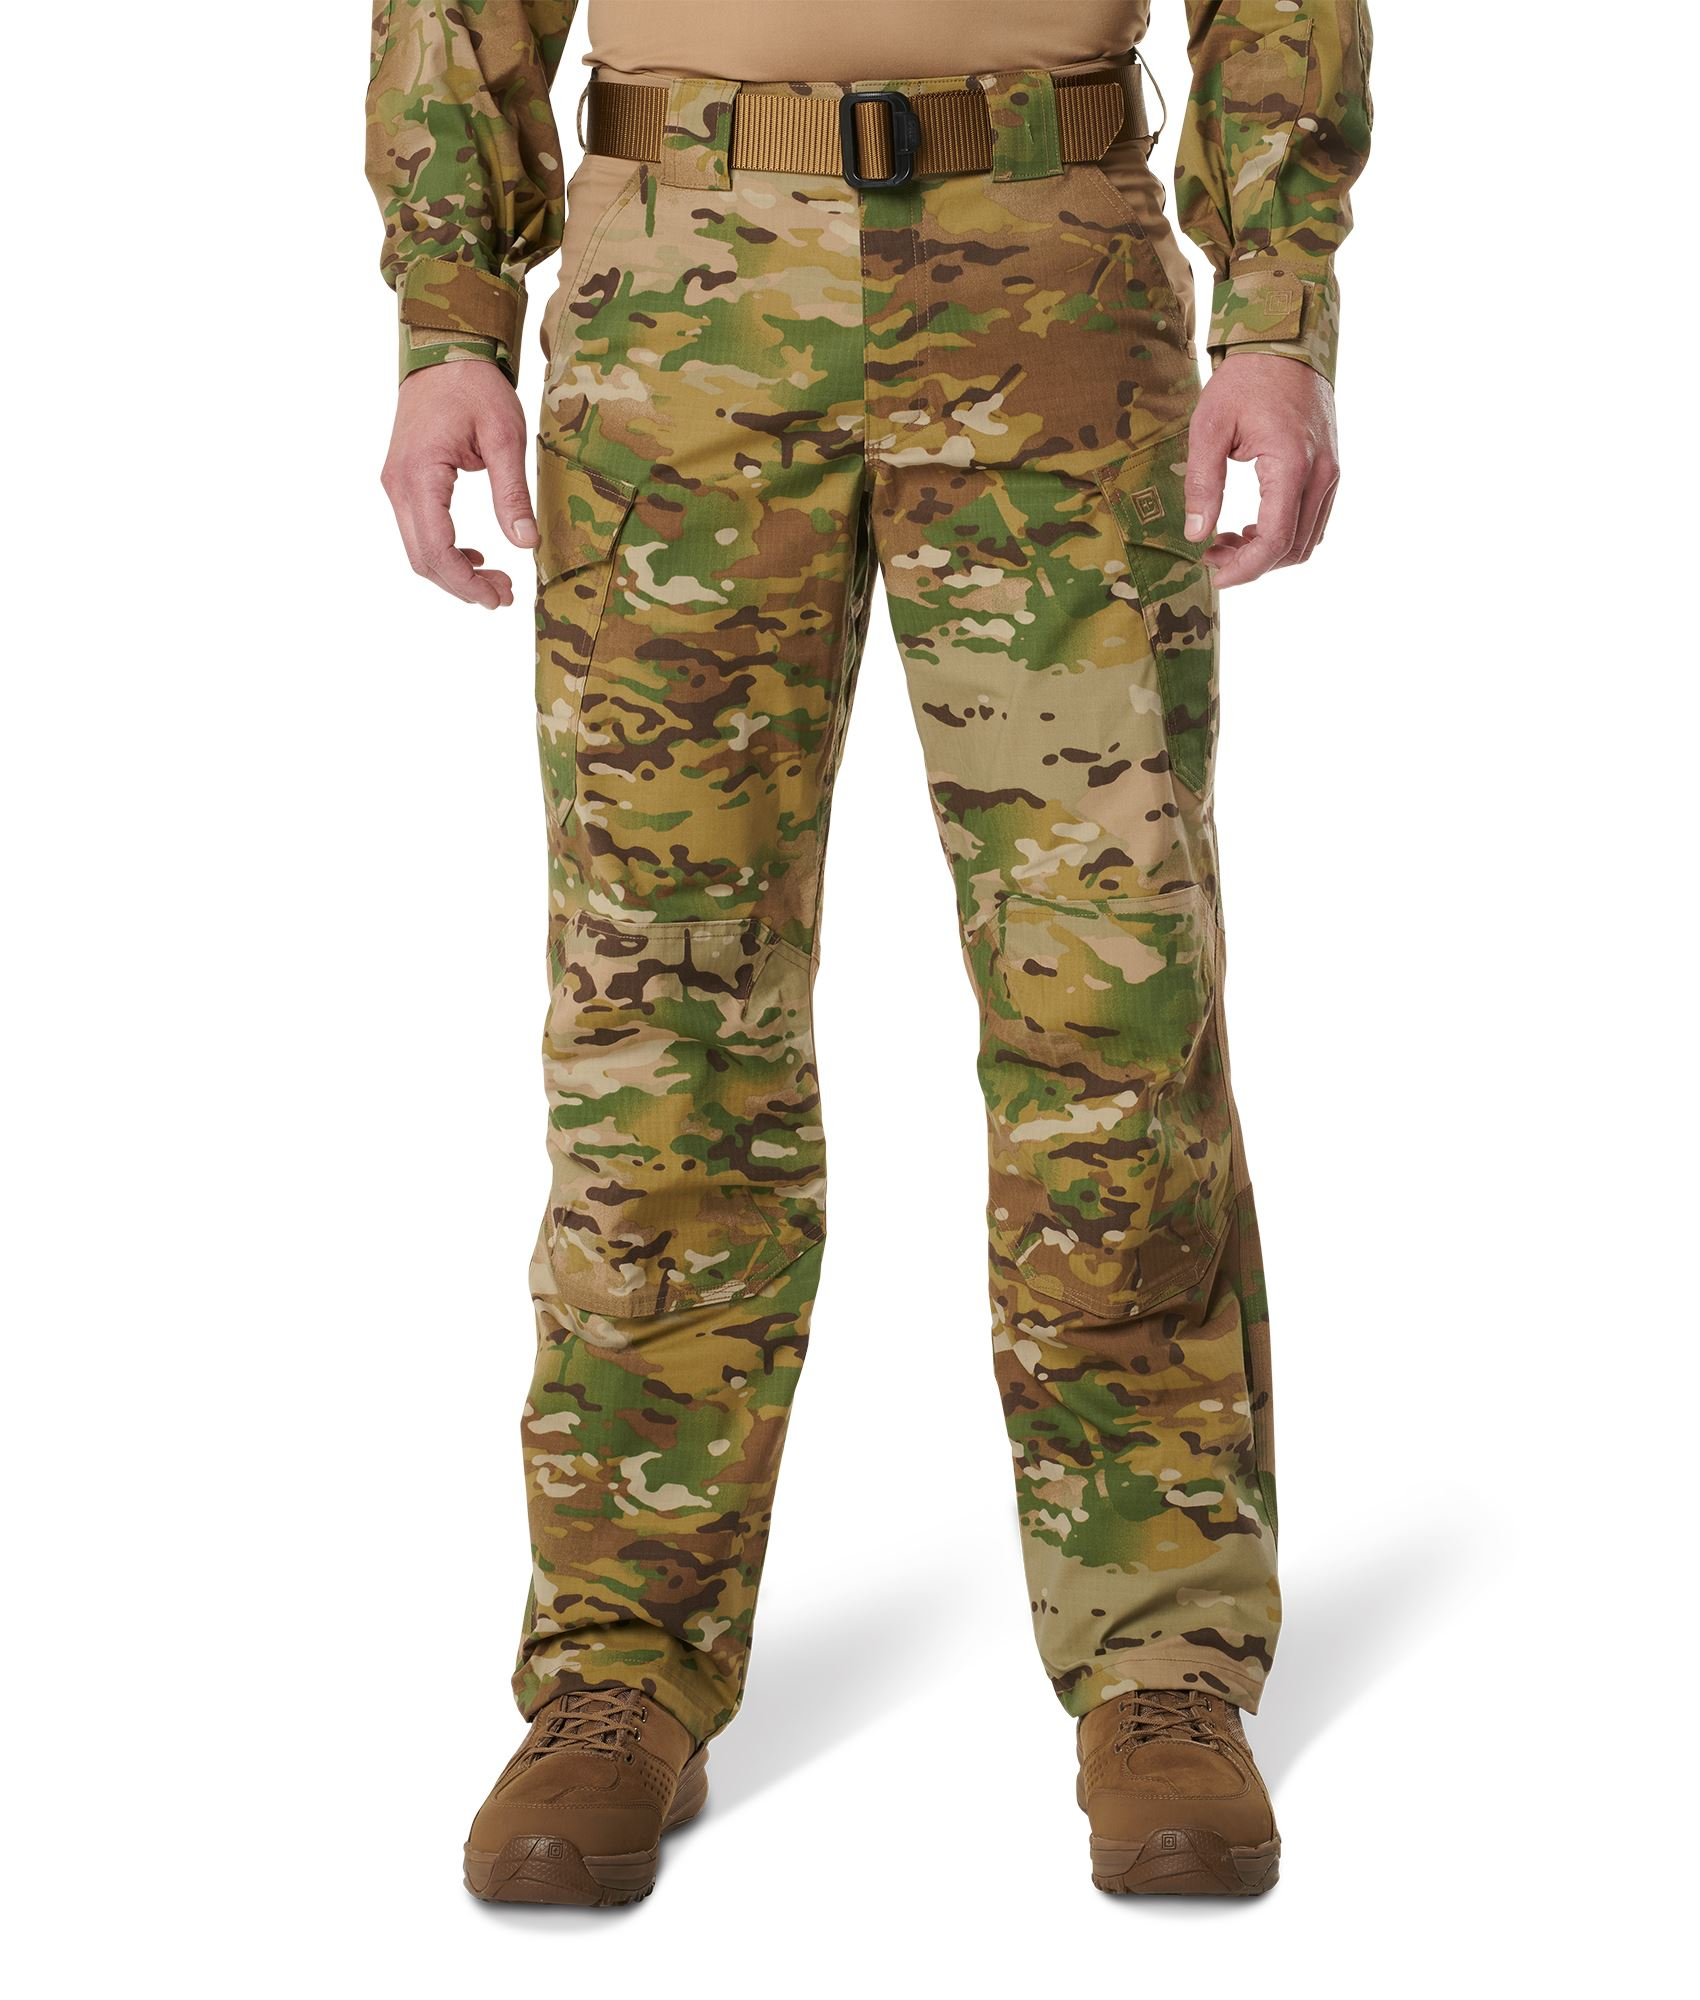 5.11 Tactical Stryke Tdu pants, multicam